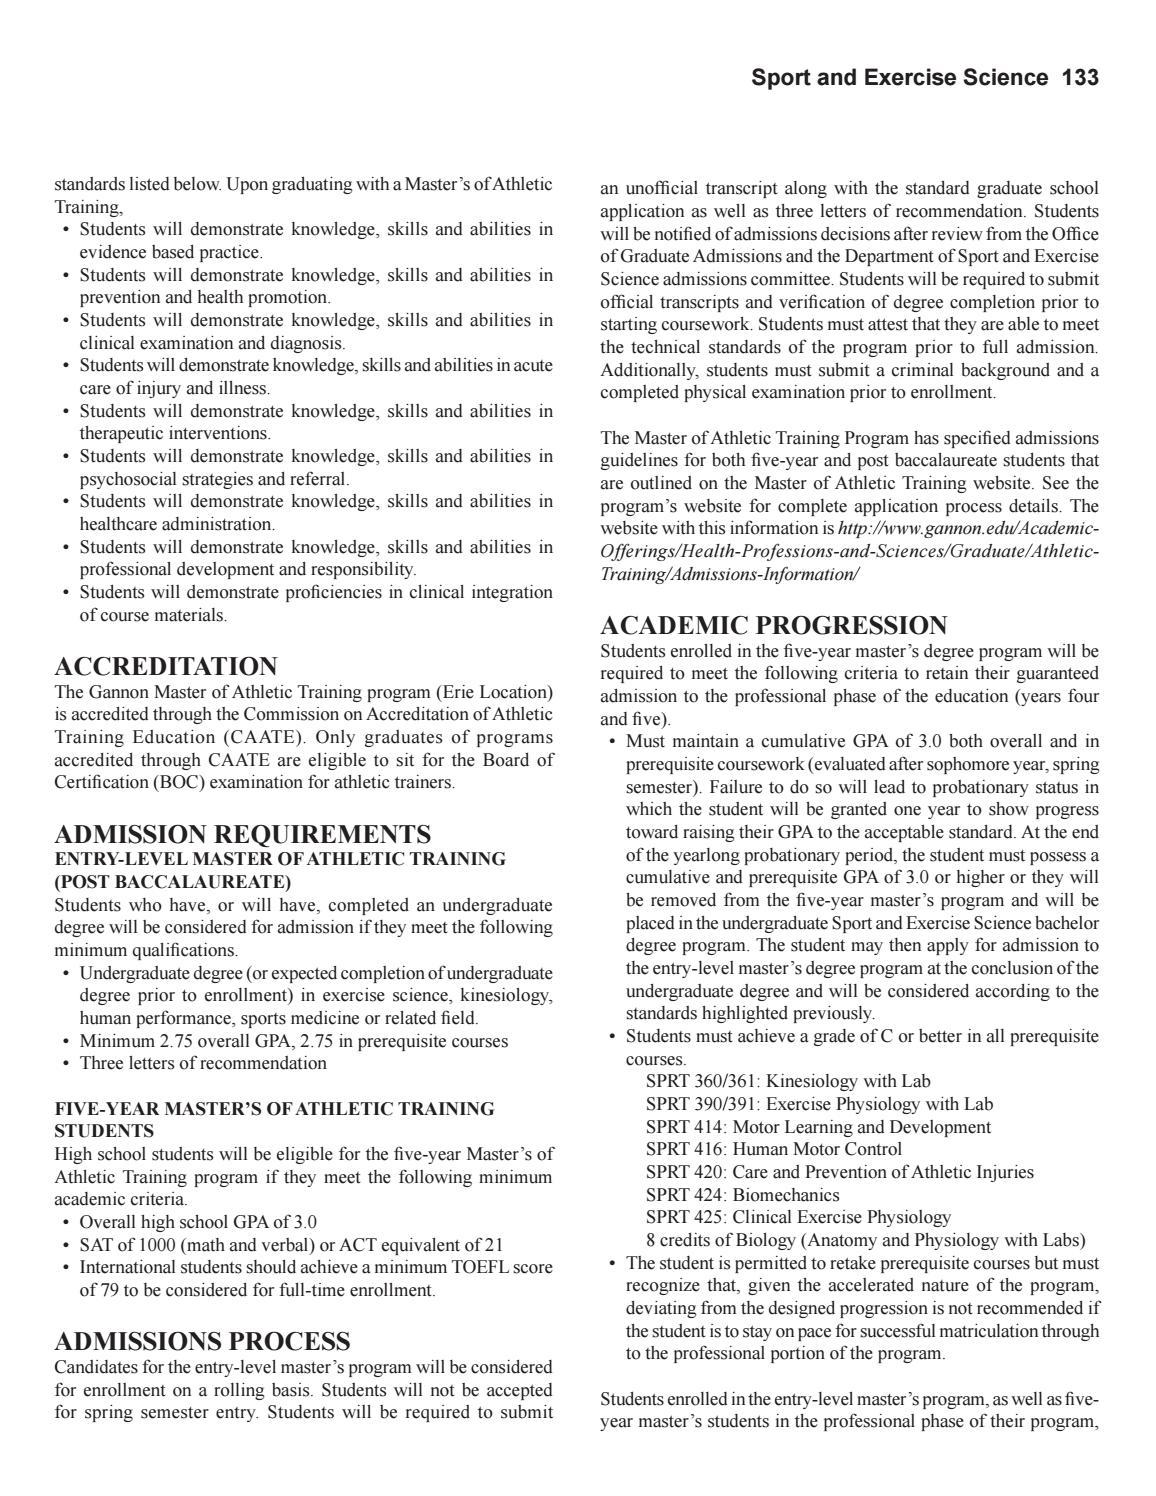 Gannon University Graduate Catalog 2017 2018 By Gannon University